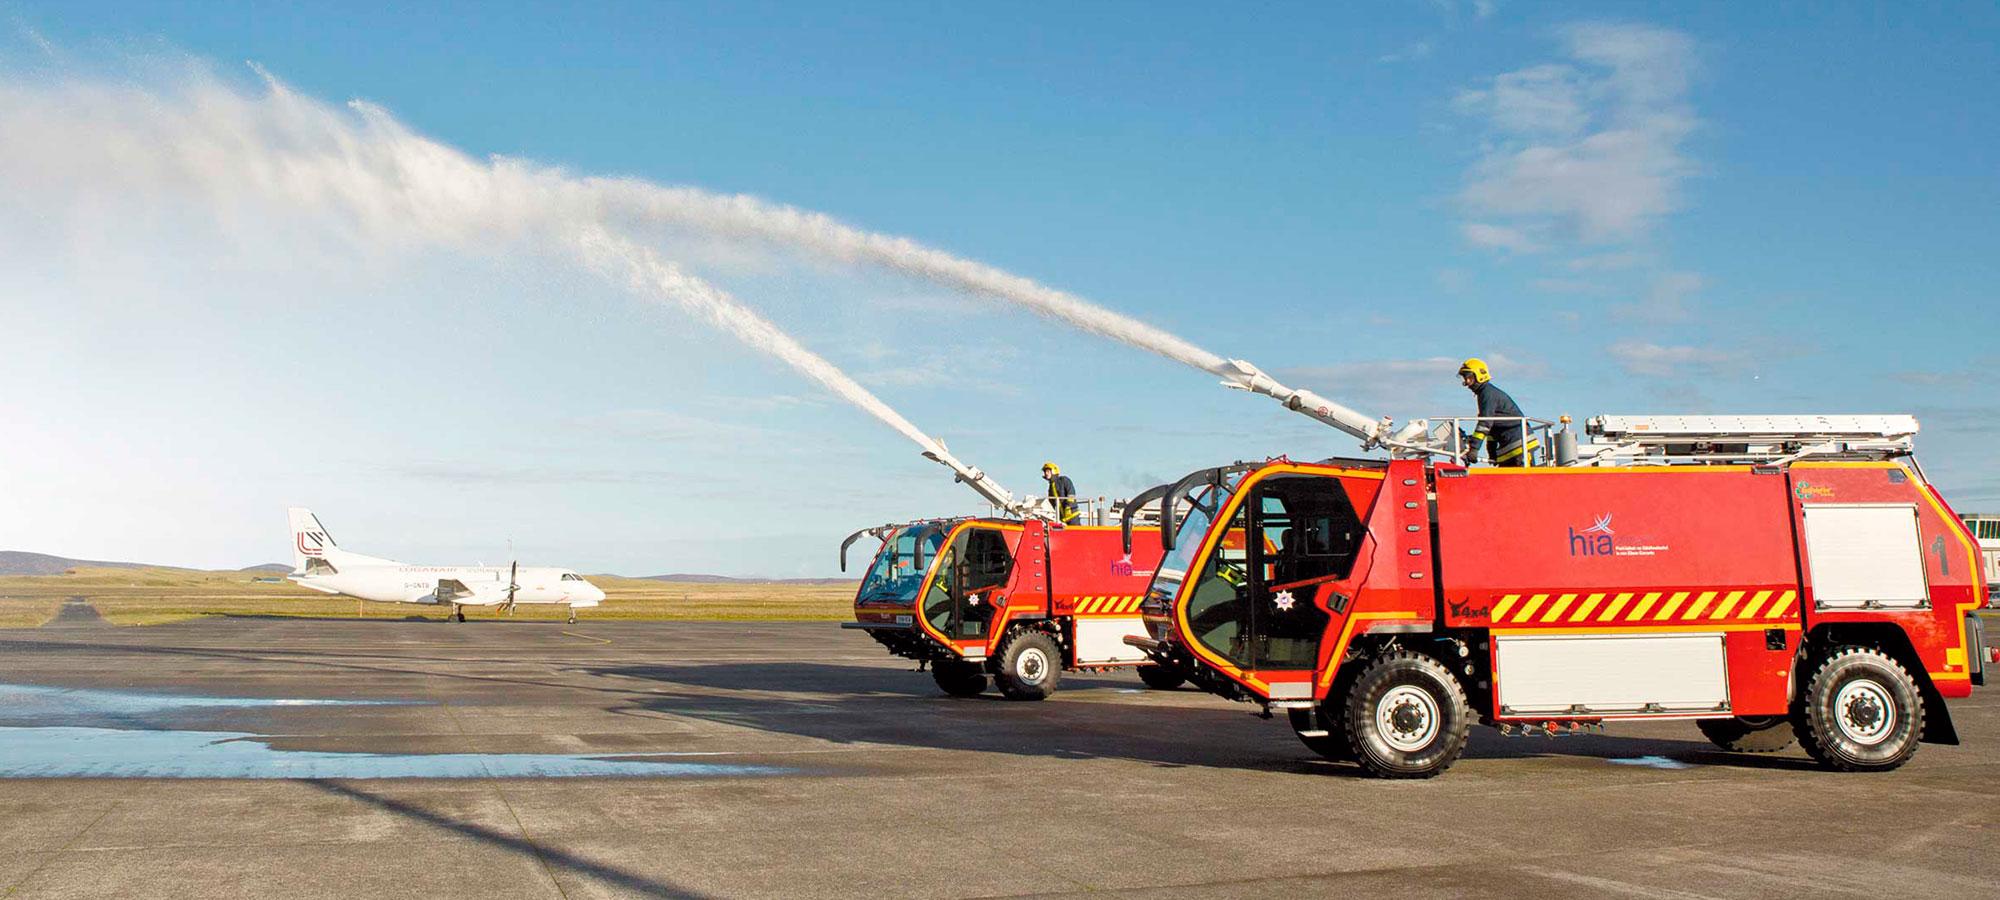 ITURRI Vehículos Aeropuerto